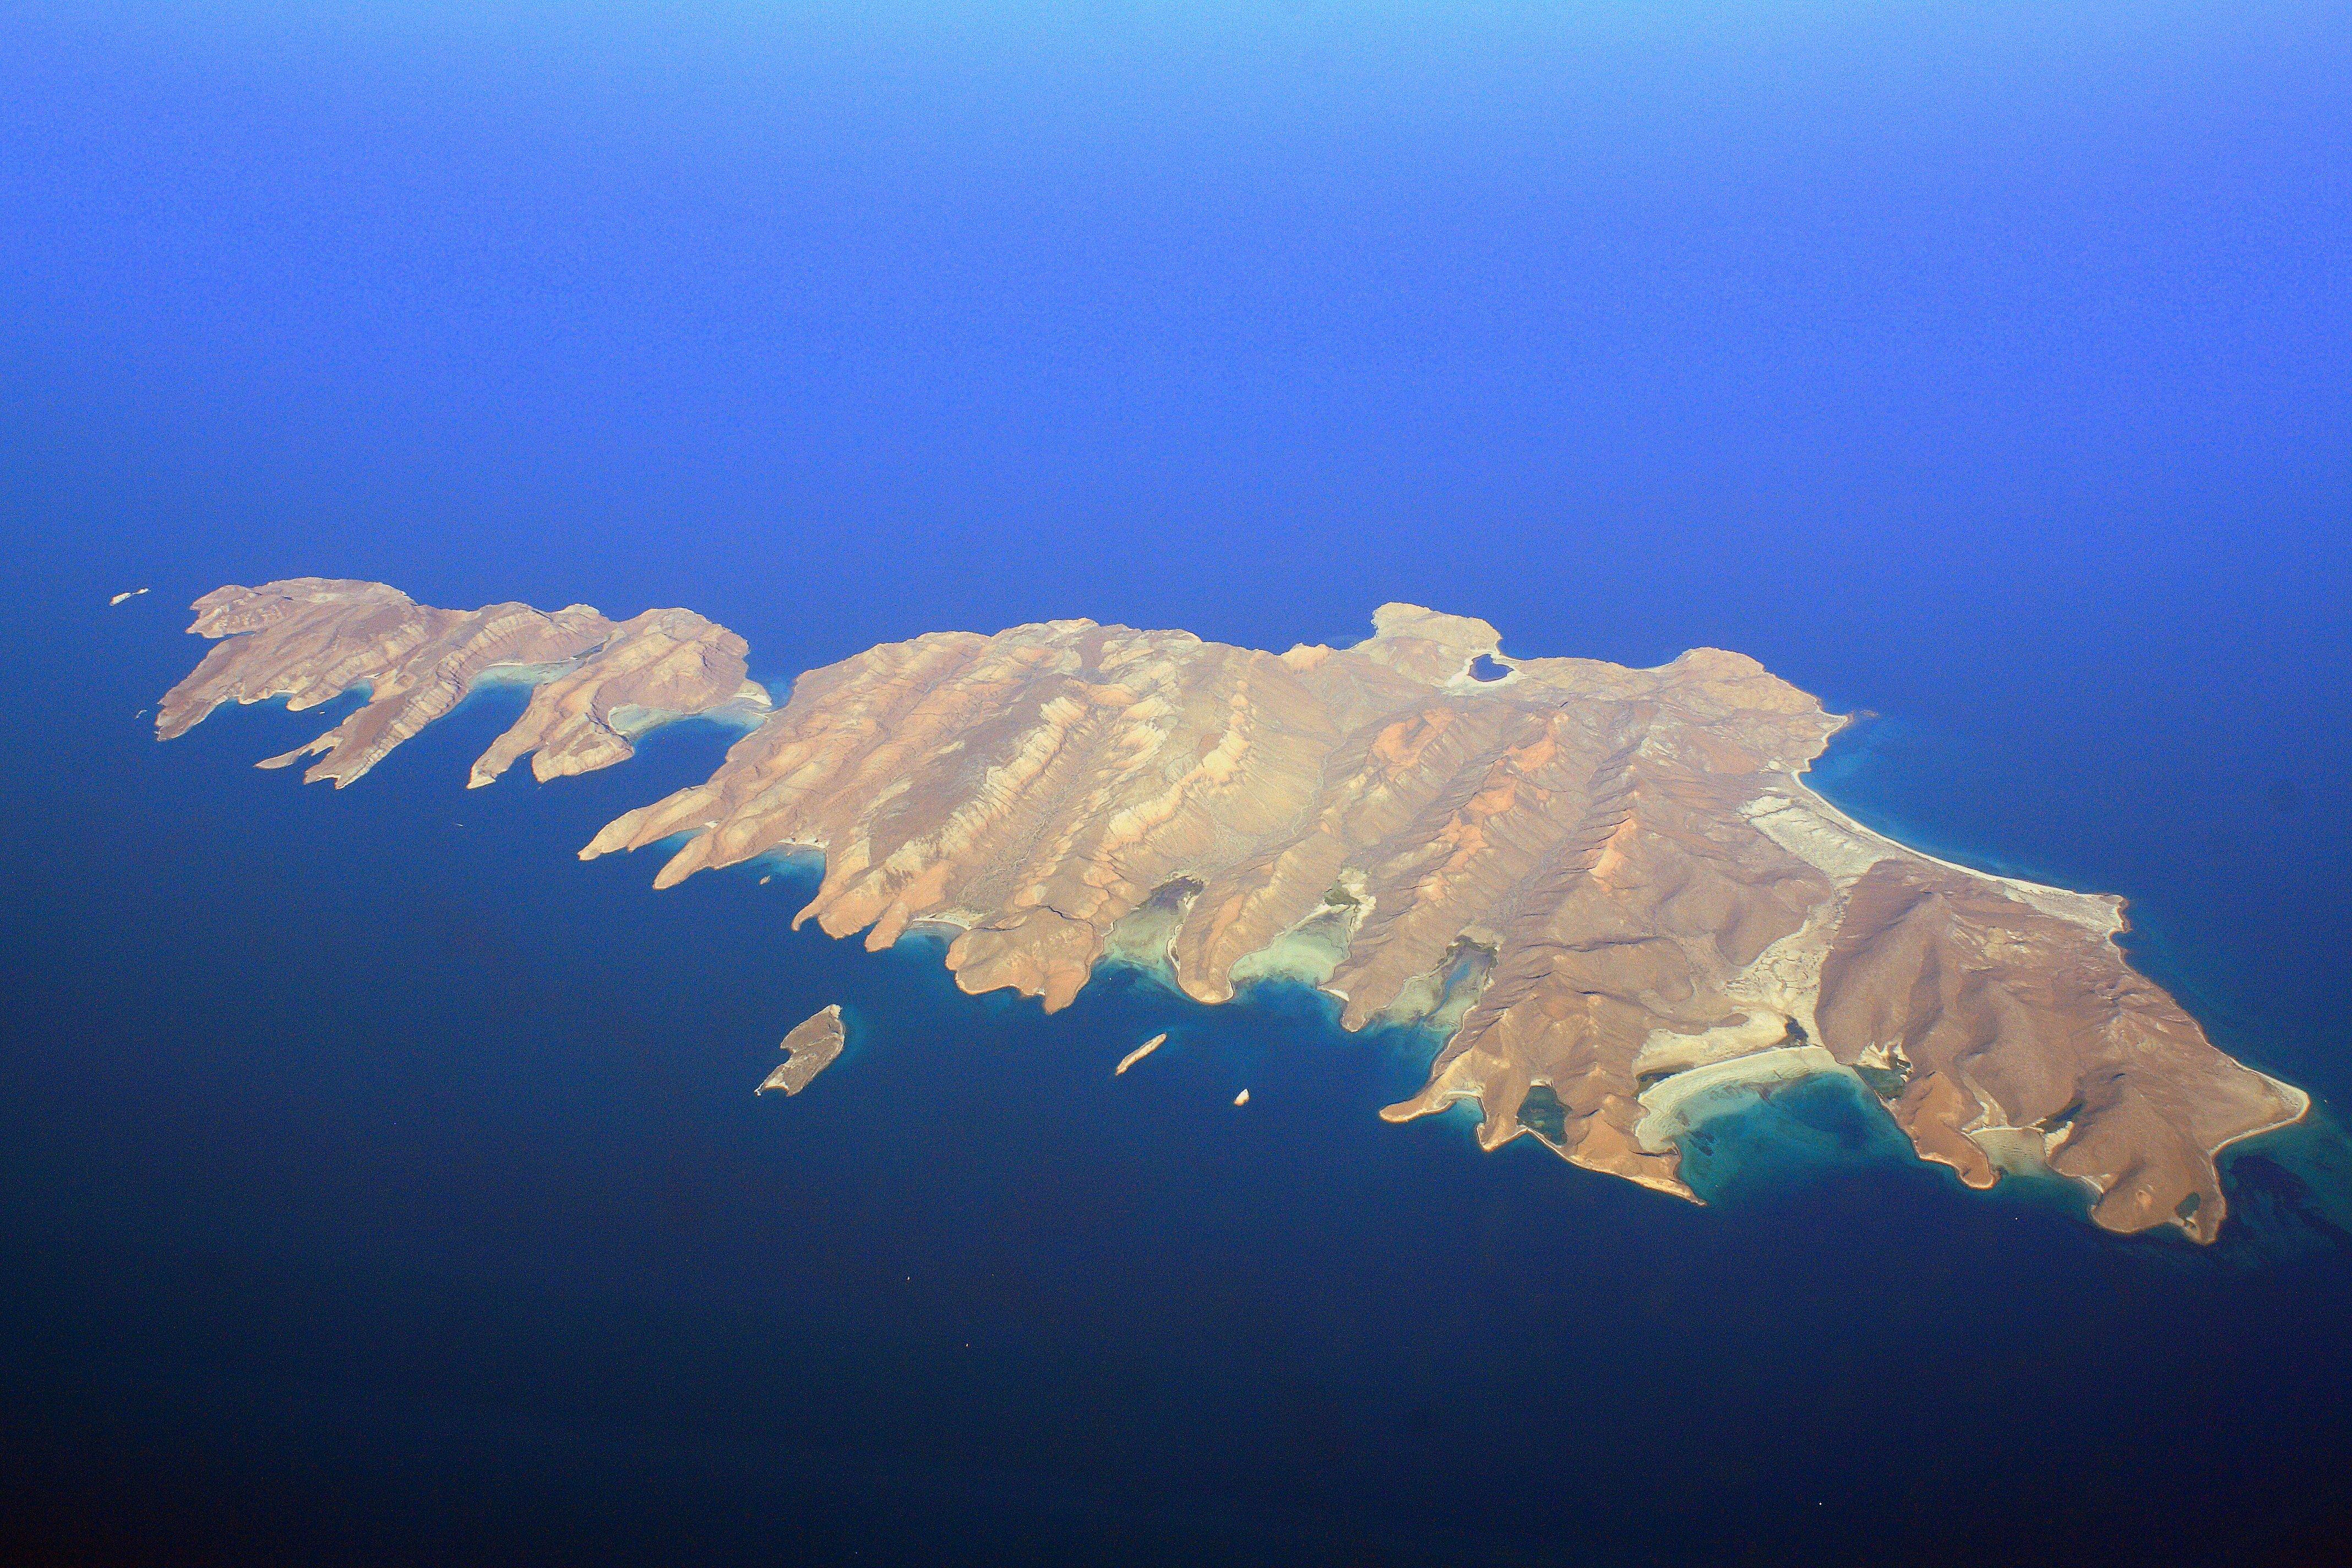 Archivo:Isla Espíritu Santo and Isla Partida (5378264191).jpg - Wikipedia,  la enciclopedia libre